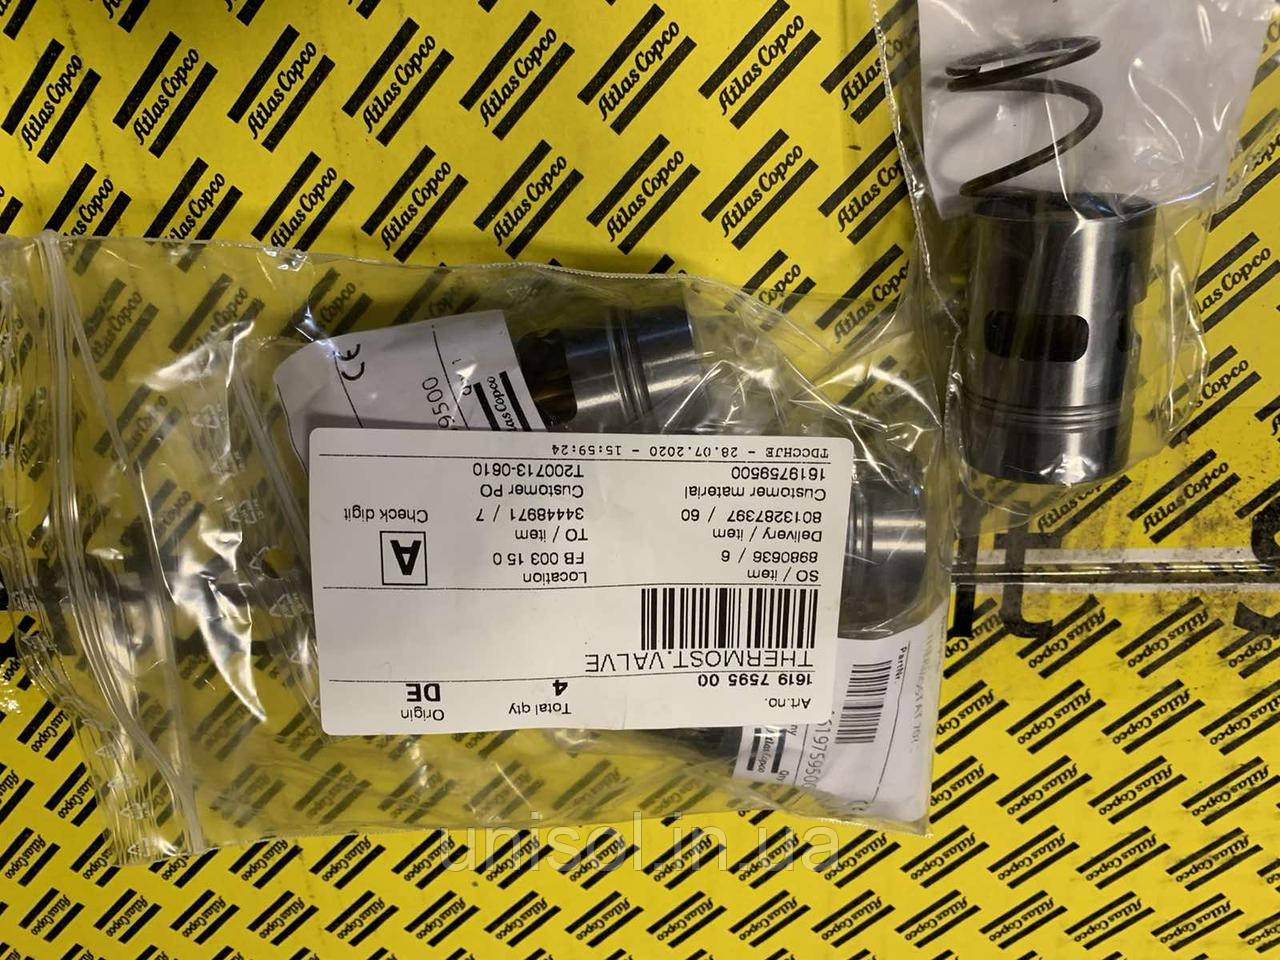 Термостат компрессора Atlas Copco 1619 7595 00